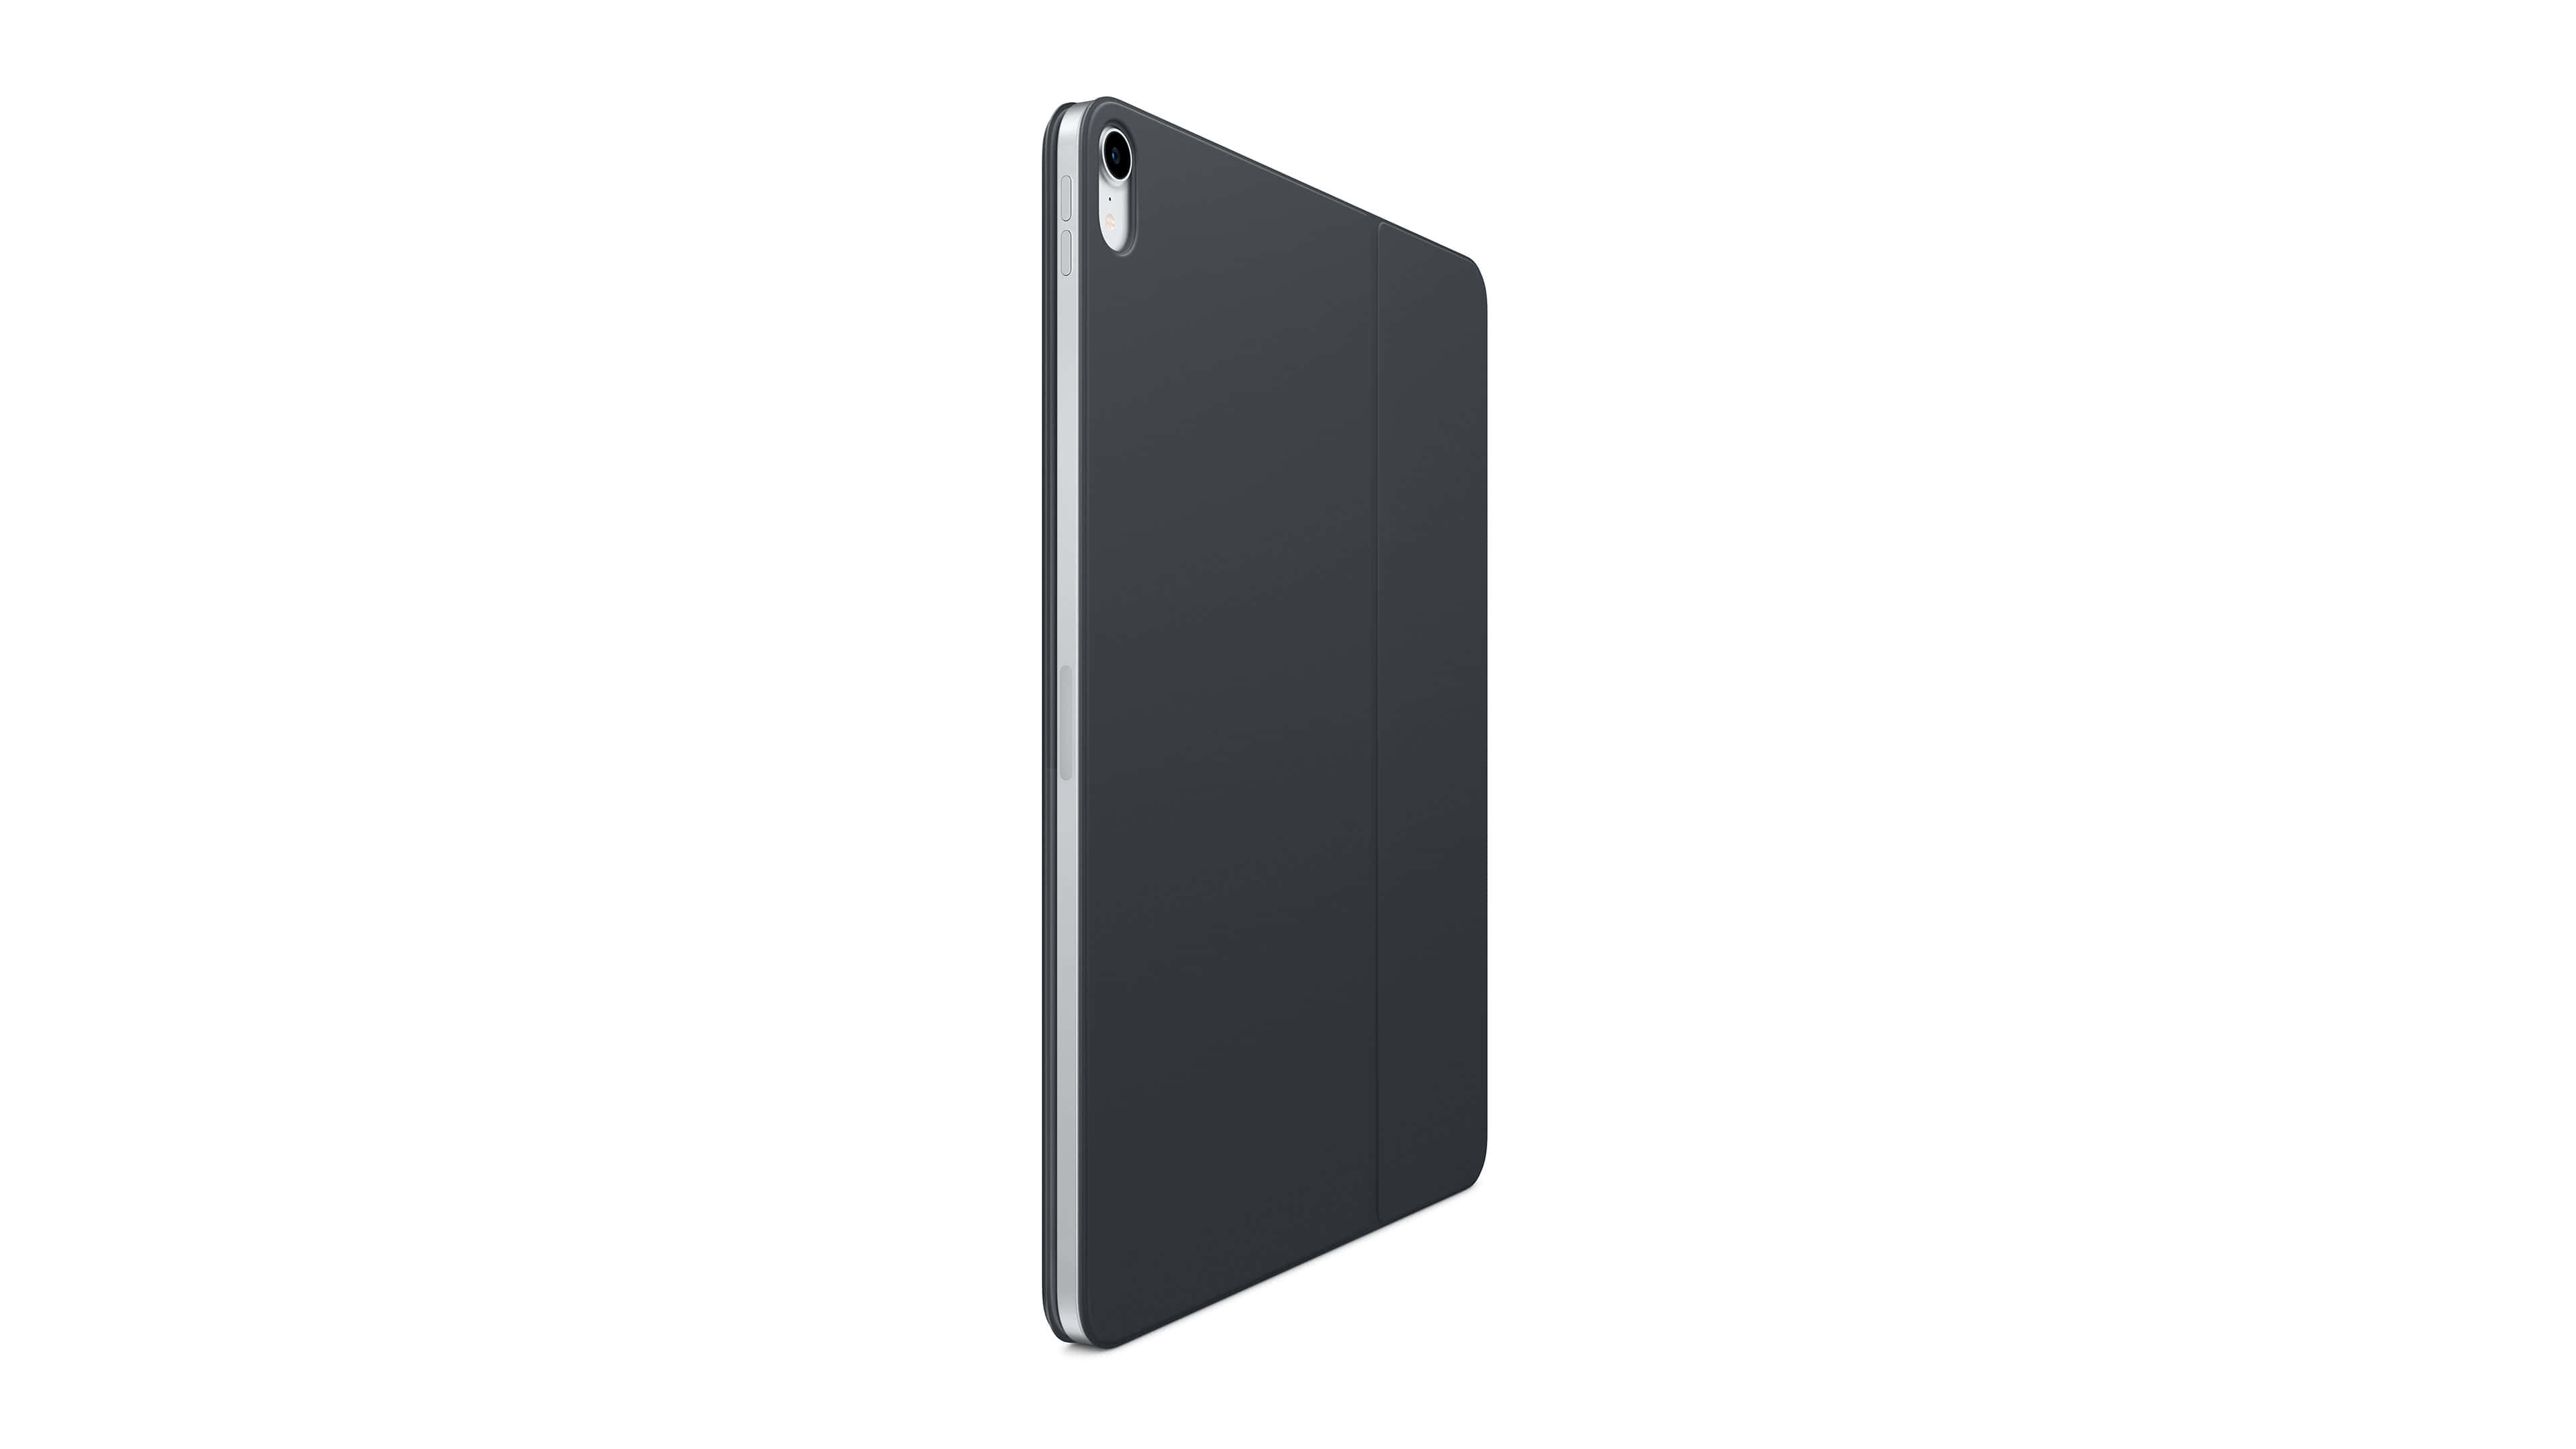 apple ipad pro 12.9 3rd generation case uhd 4k wallpaper